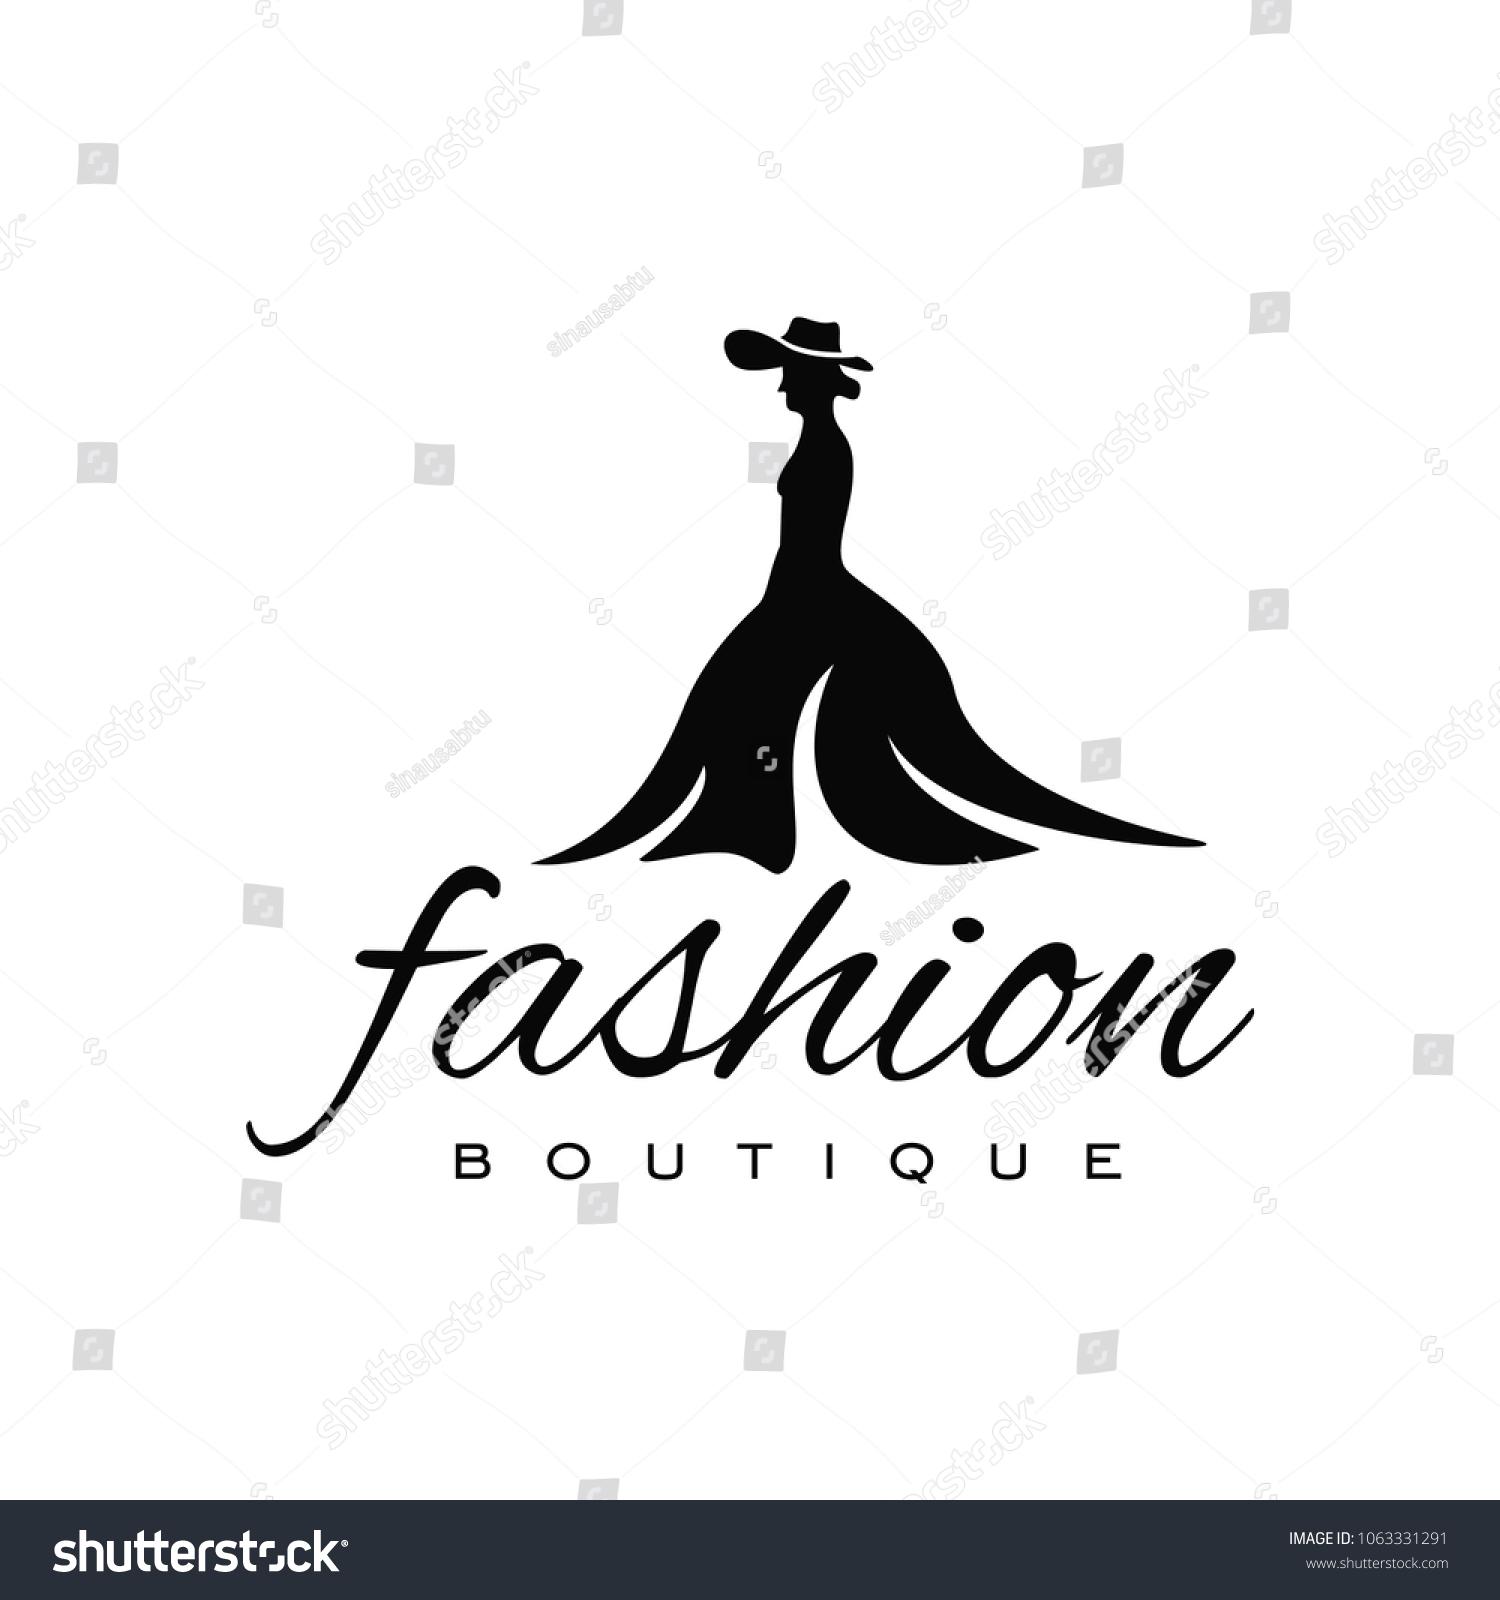 Hequ Fashion New Twenty One Pilots Big Logo Hooded Male Streetwear Kaos Band Original Gildan Cliqueart Dress Design Template Stock Vector Royalty Free 1500x1600 Kangaroo